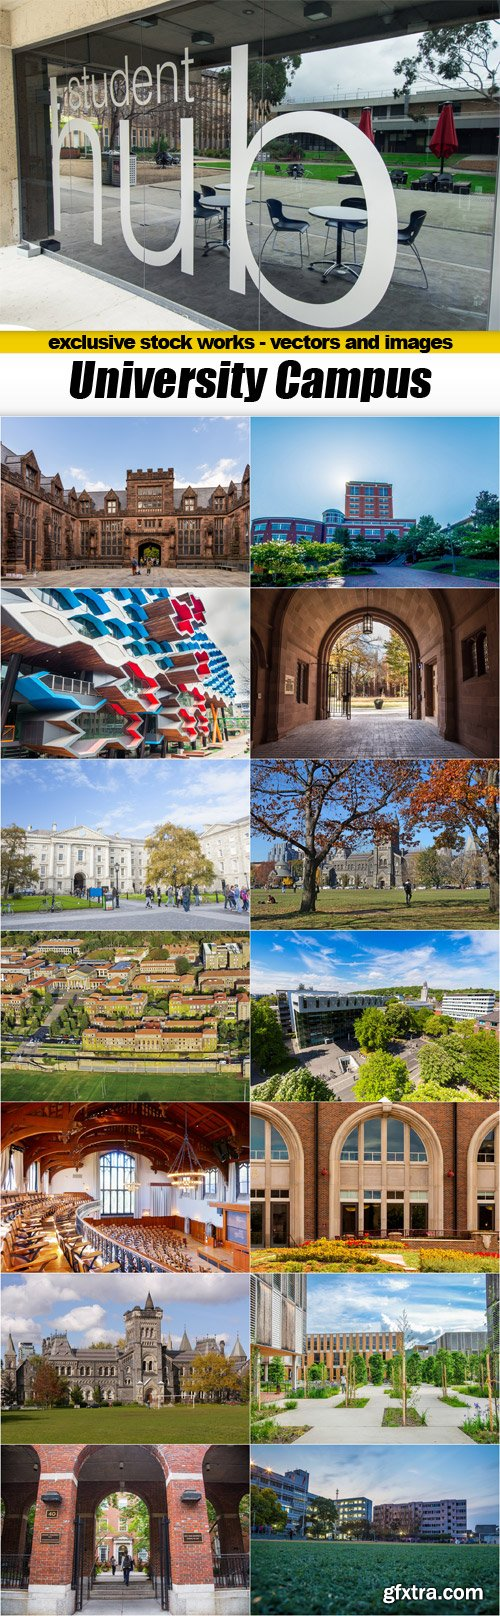 University Campus - 15x JPEGs